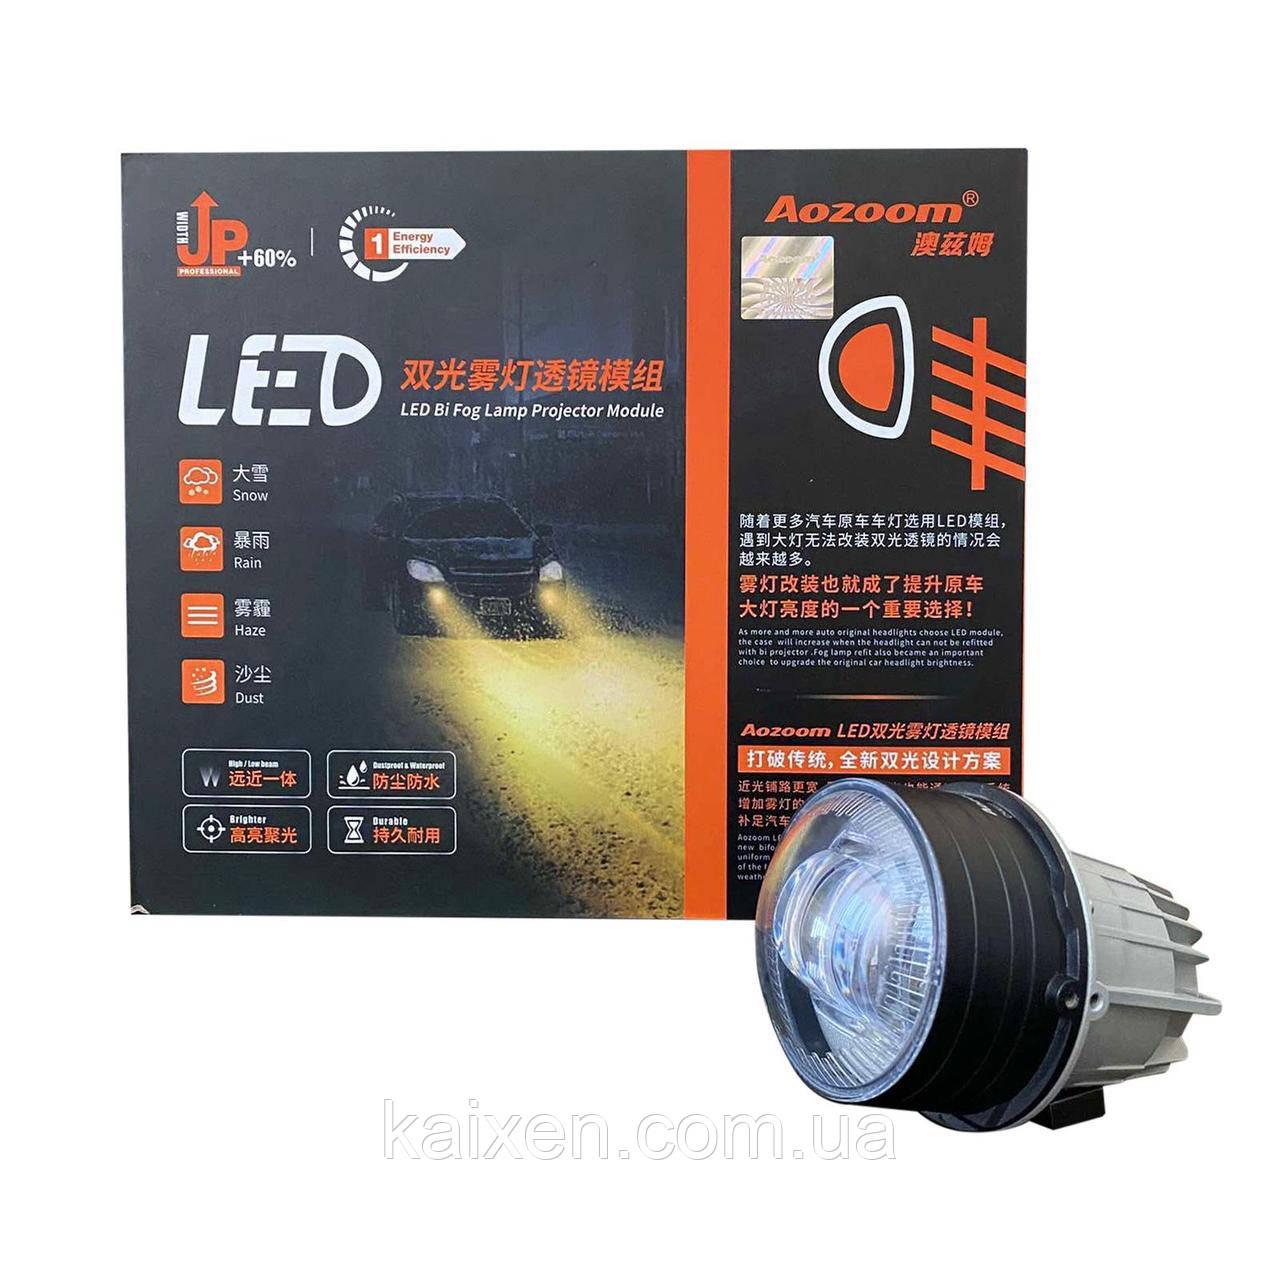 LED ВТФ AOZOOM (DRL/WHITE/YELLOW)